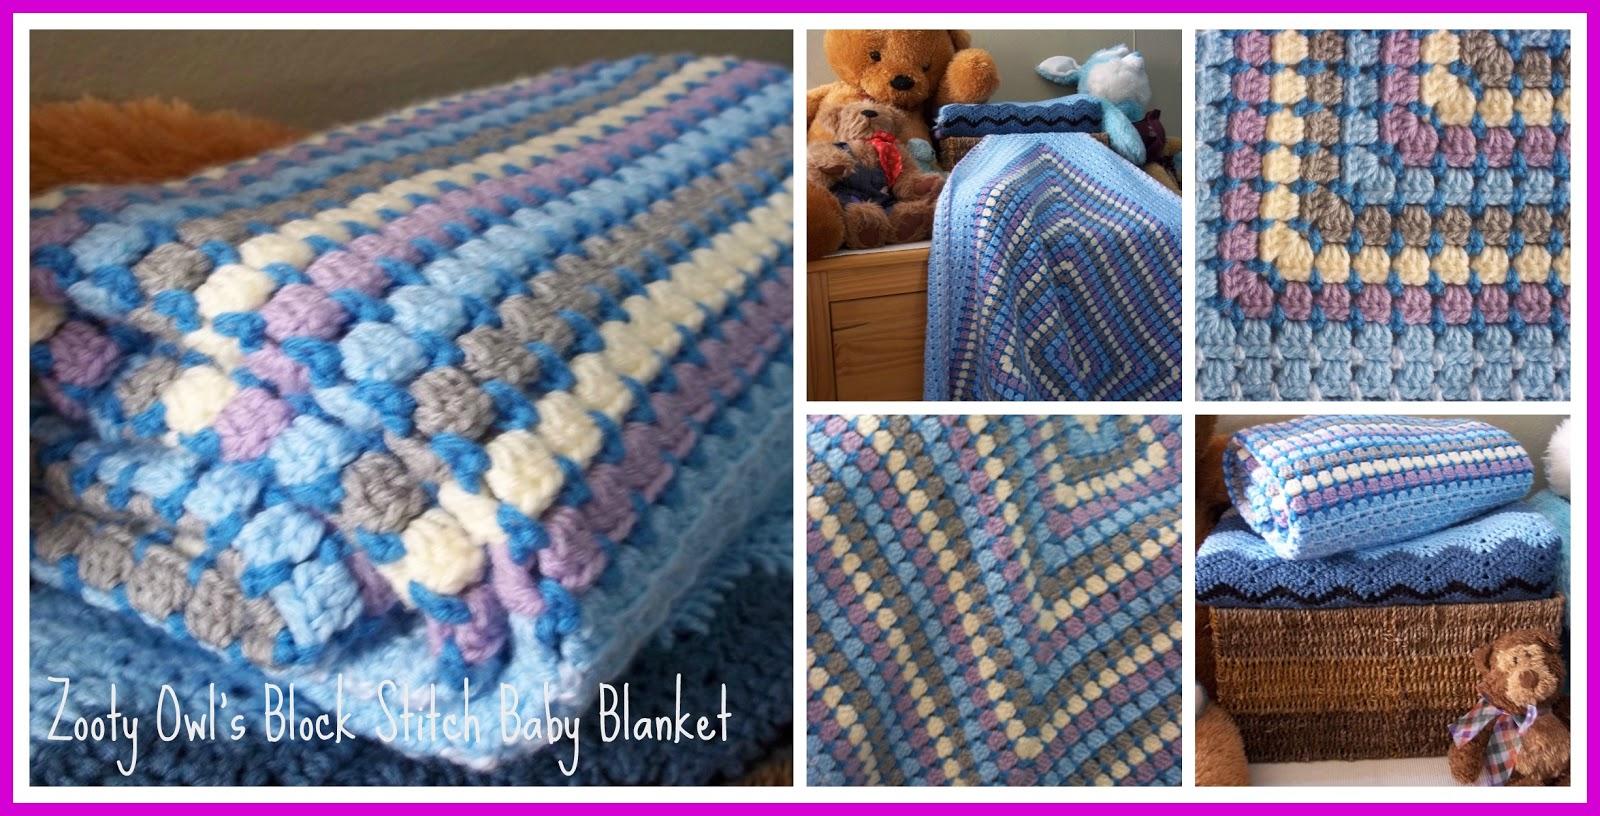 Zooty Owl\'s Crafty Blog: Block Stitch Baby Blanket